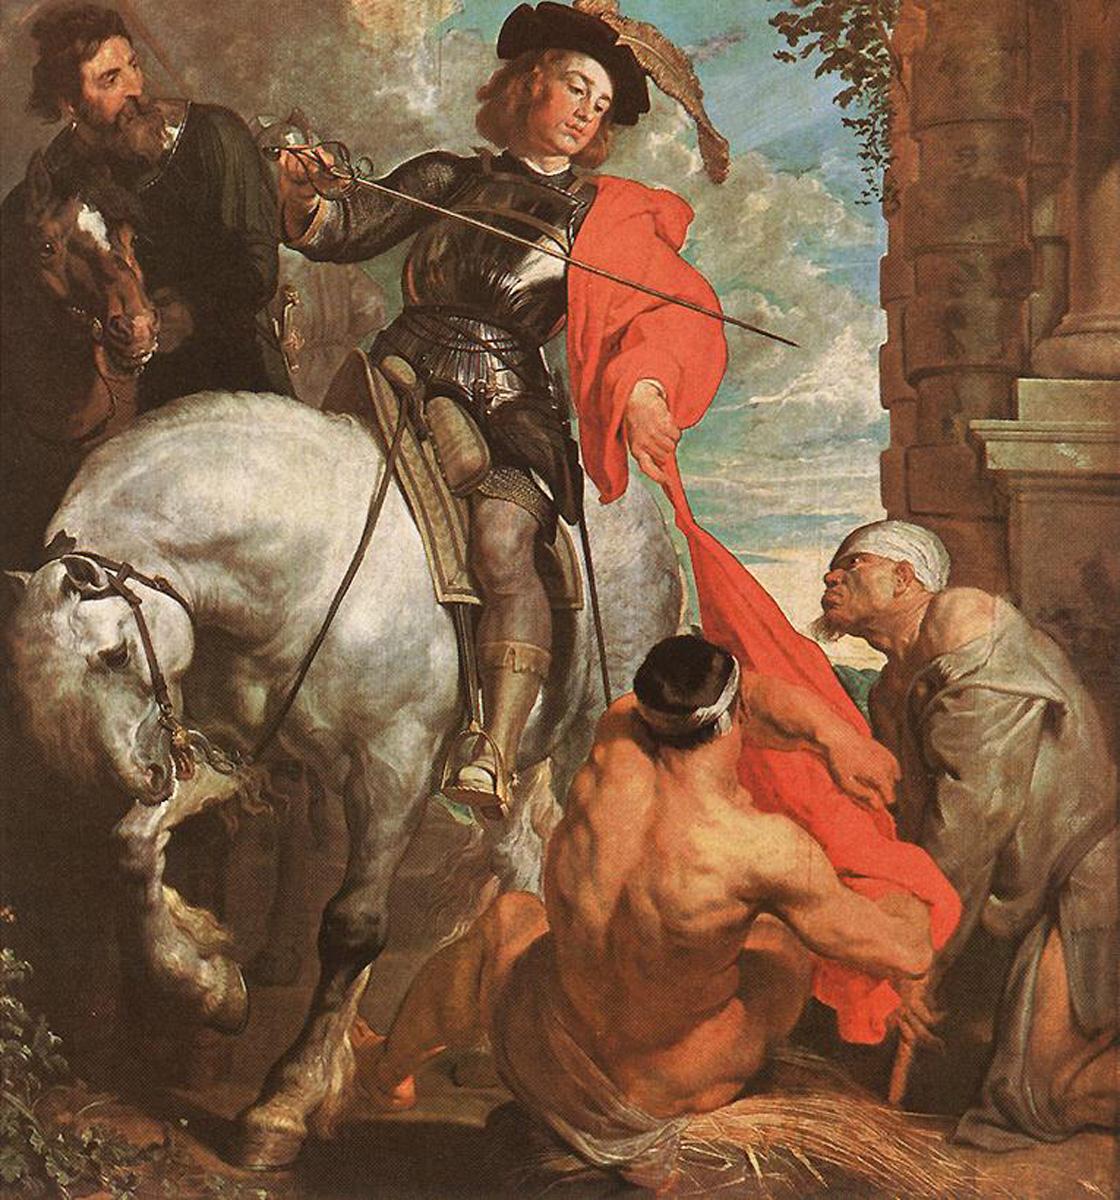 Van_Dyck,_Anthony_-_St_Martin_Dividing_his_Cloak_-_c._1618.jpg